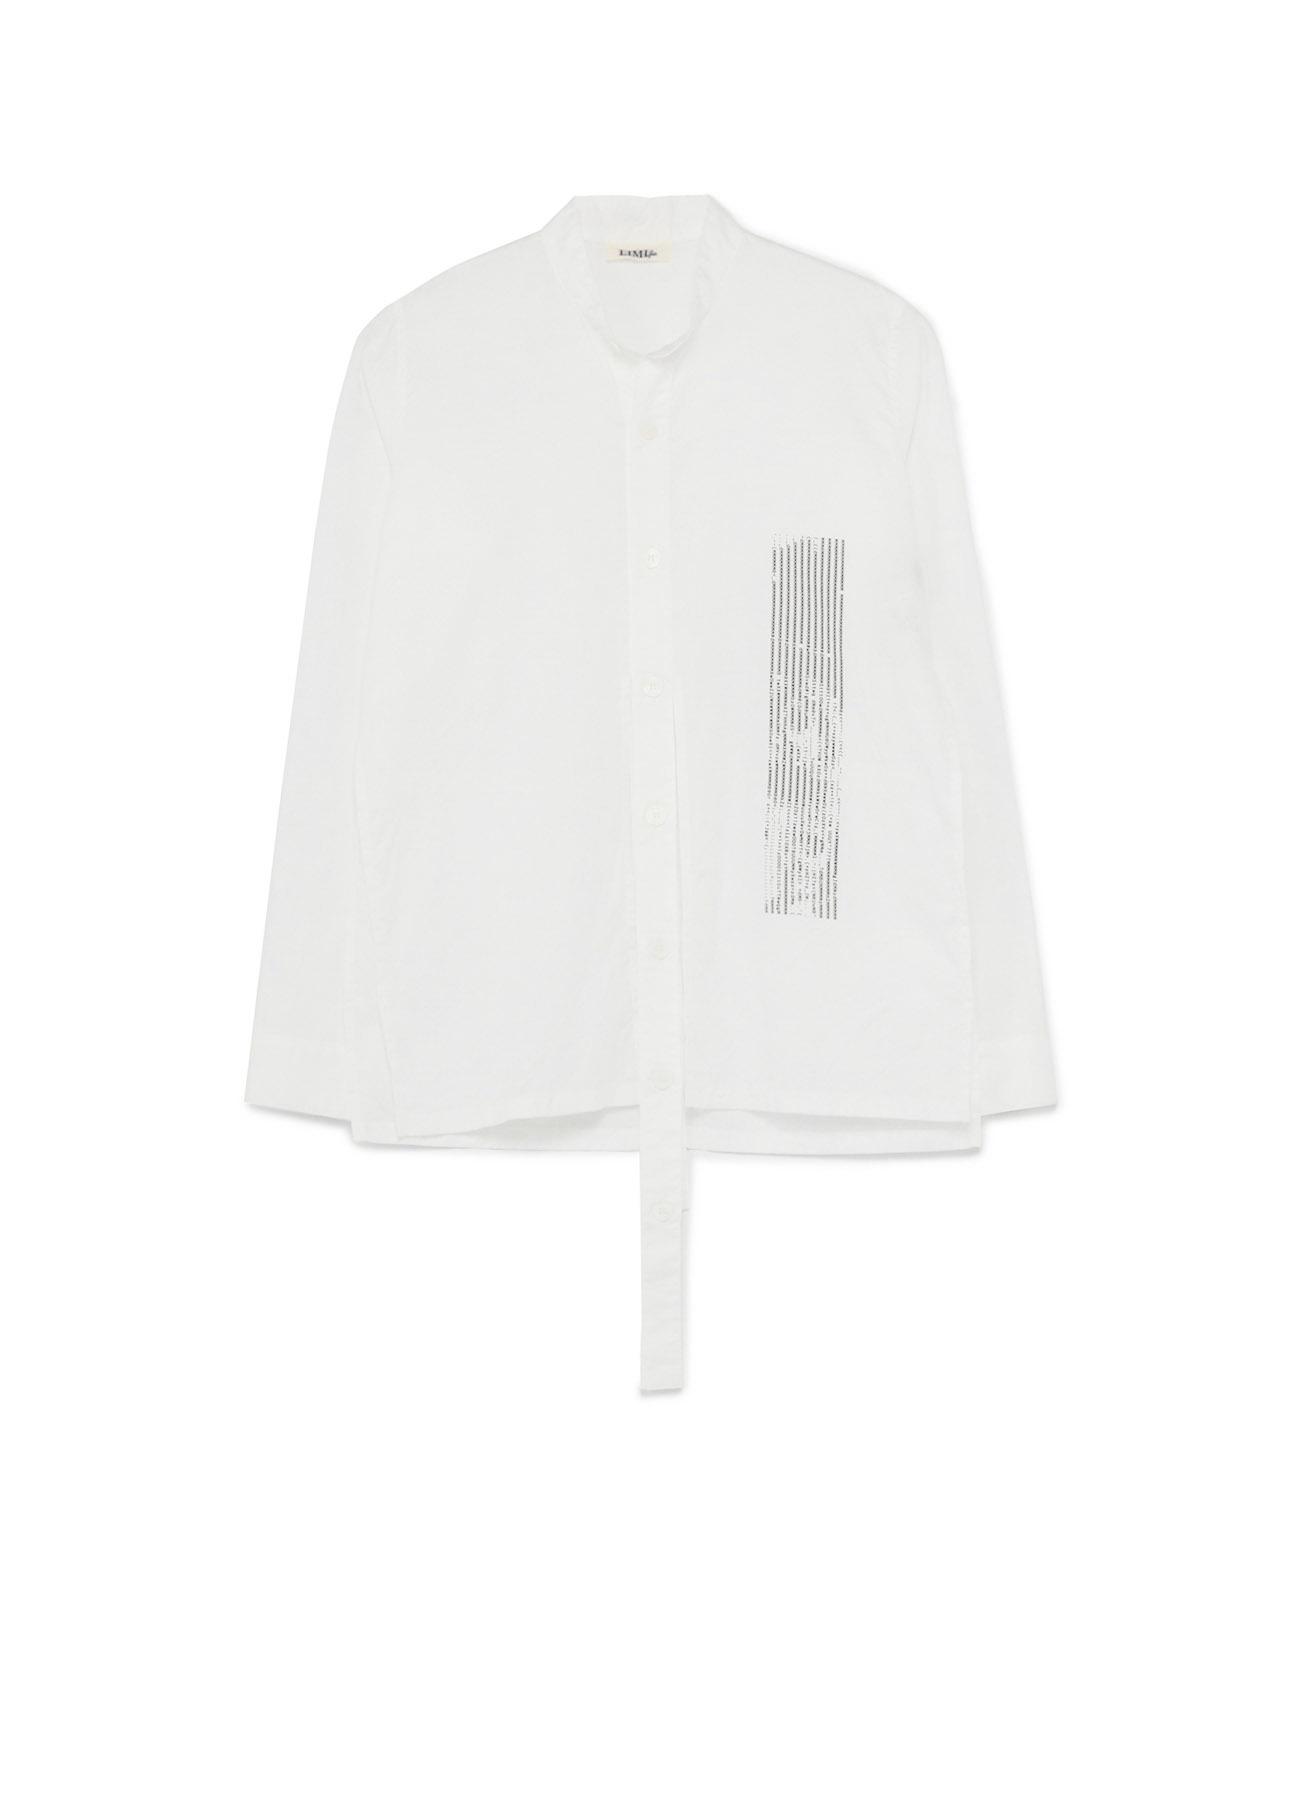 Cotton Ascii Eye Print A Stand Collar Long Tape Shirt